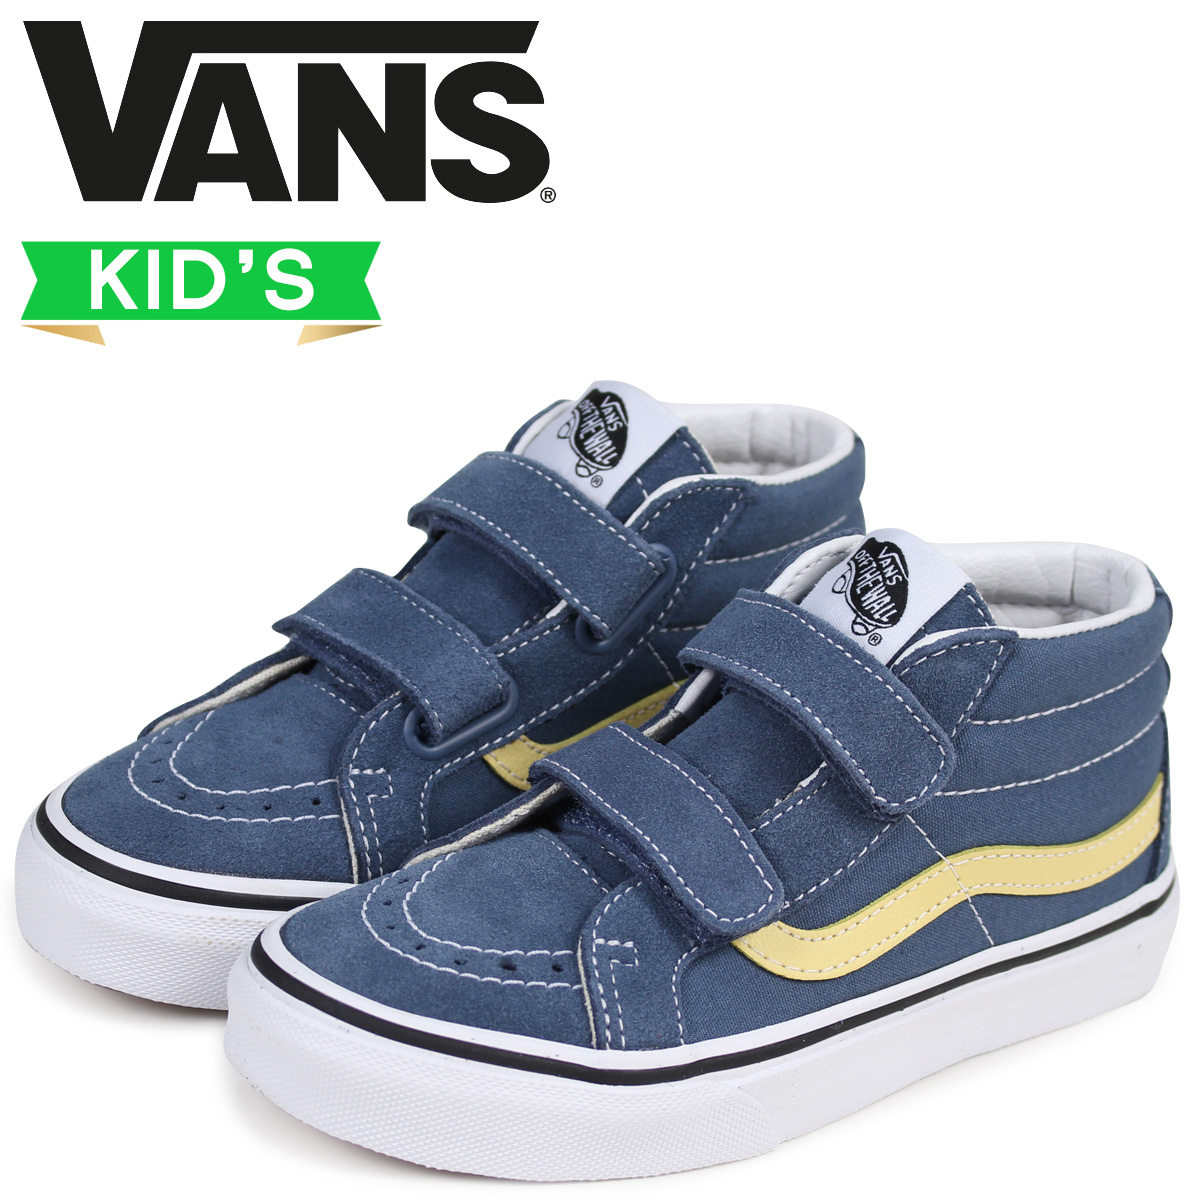 6f53af70cf Vans SK8-MID sneakers kids VANS station wagons KIDS REISSUE VELCRO  VN0A346YQ8D gray  2 16 Shinnyu load